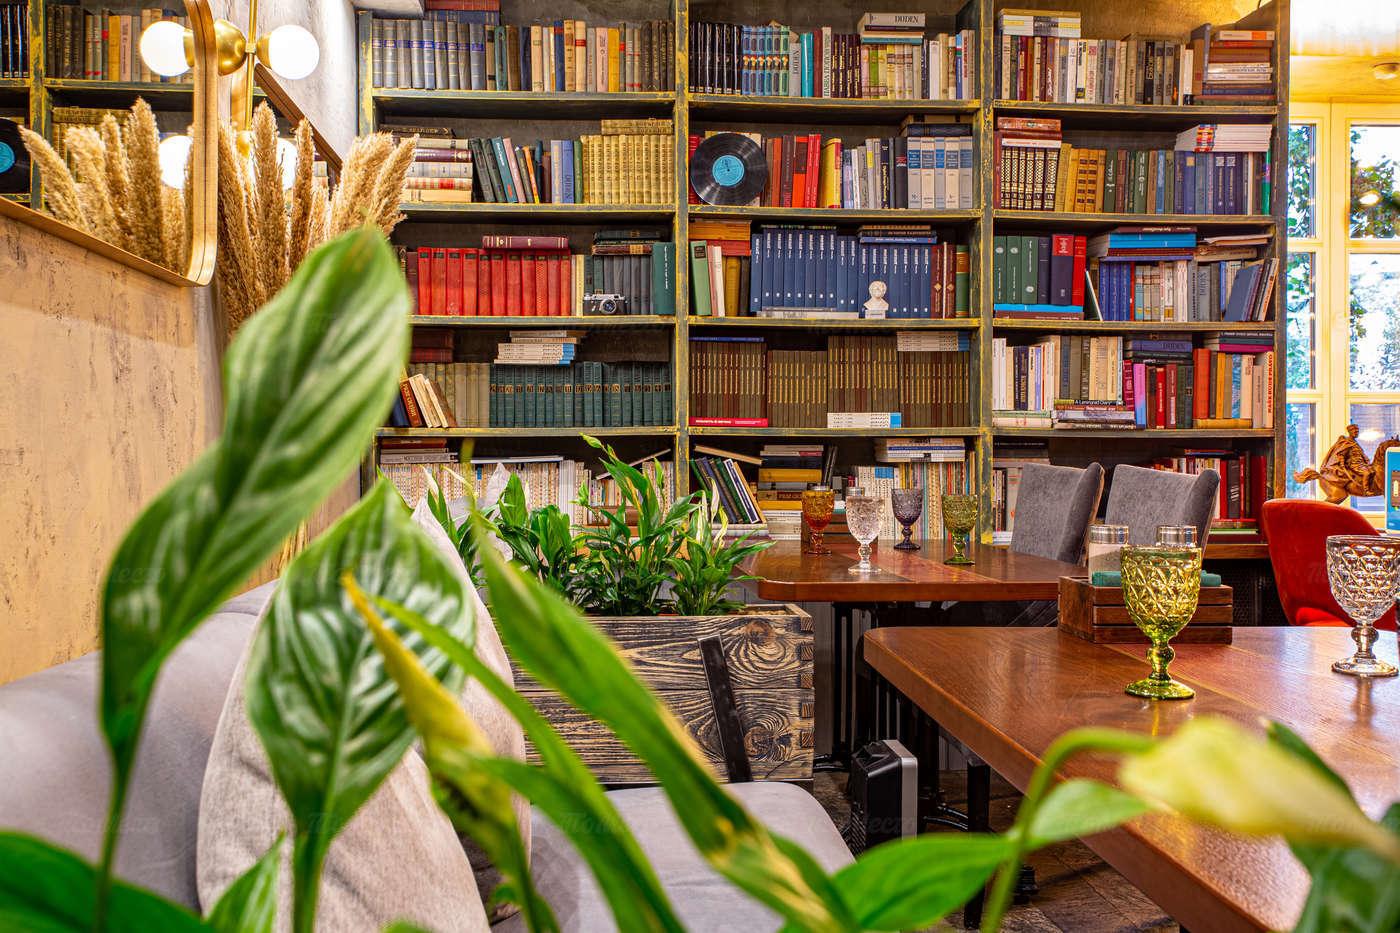 Ресторан IL LETTERATO (Литератор) в Петроверигском переулке фото 7